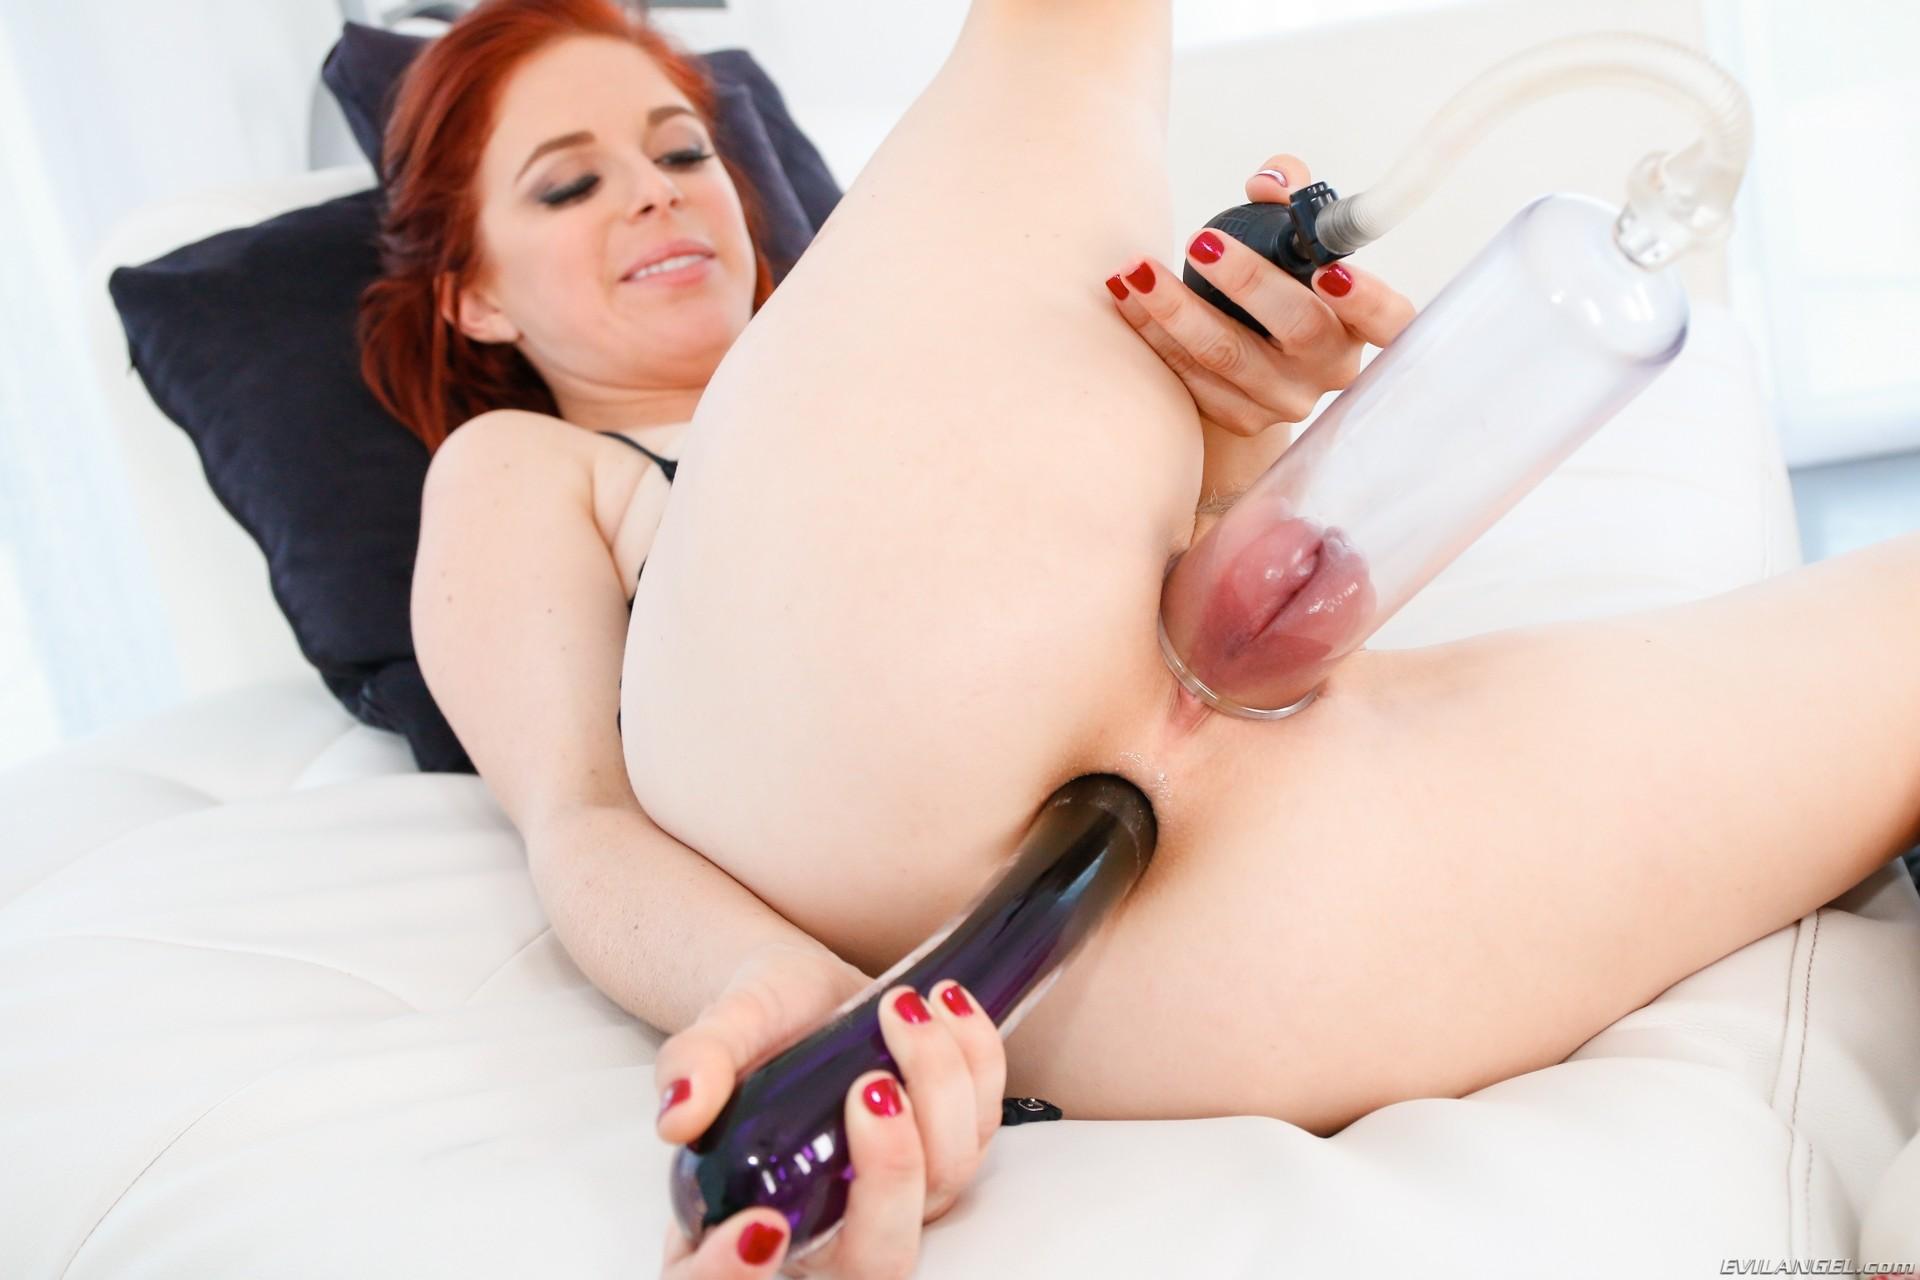 Penny pax pussy acrobats